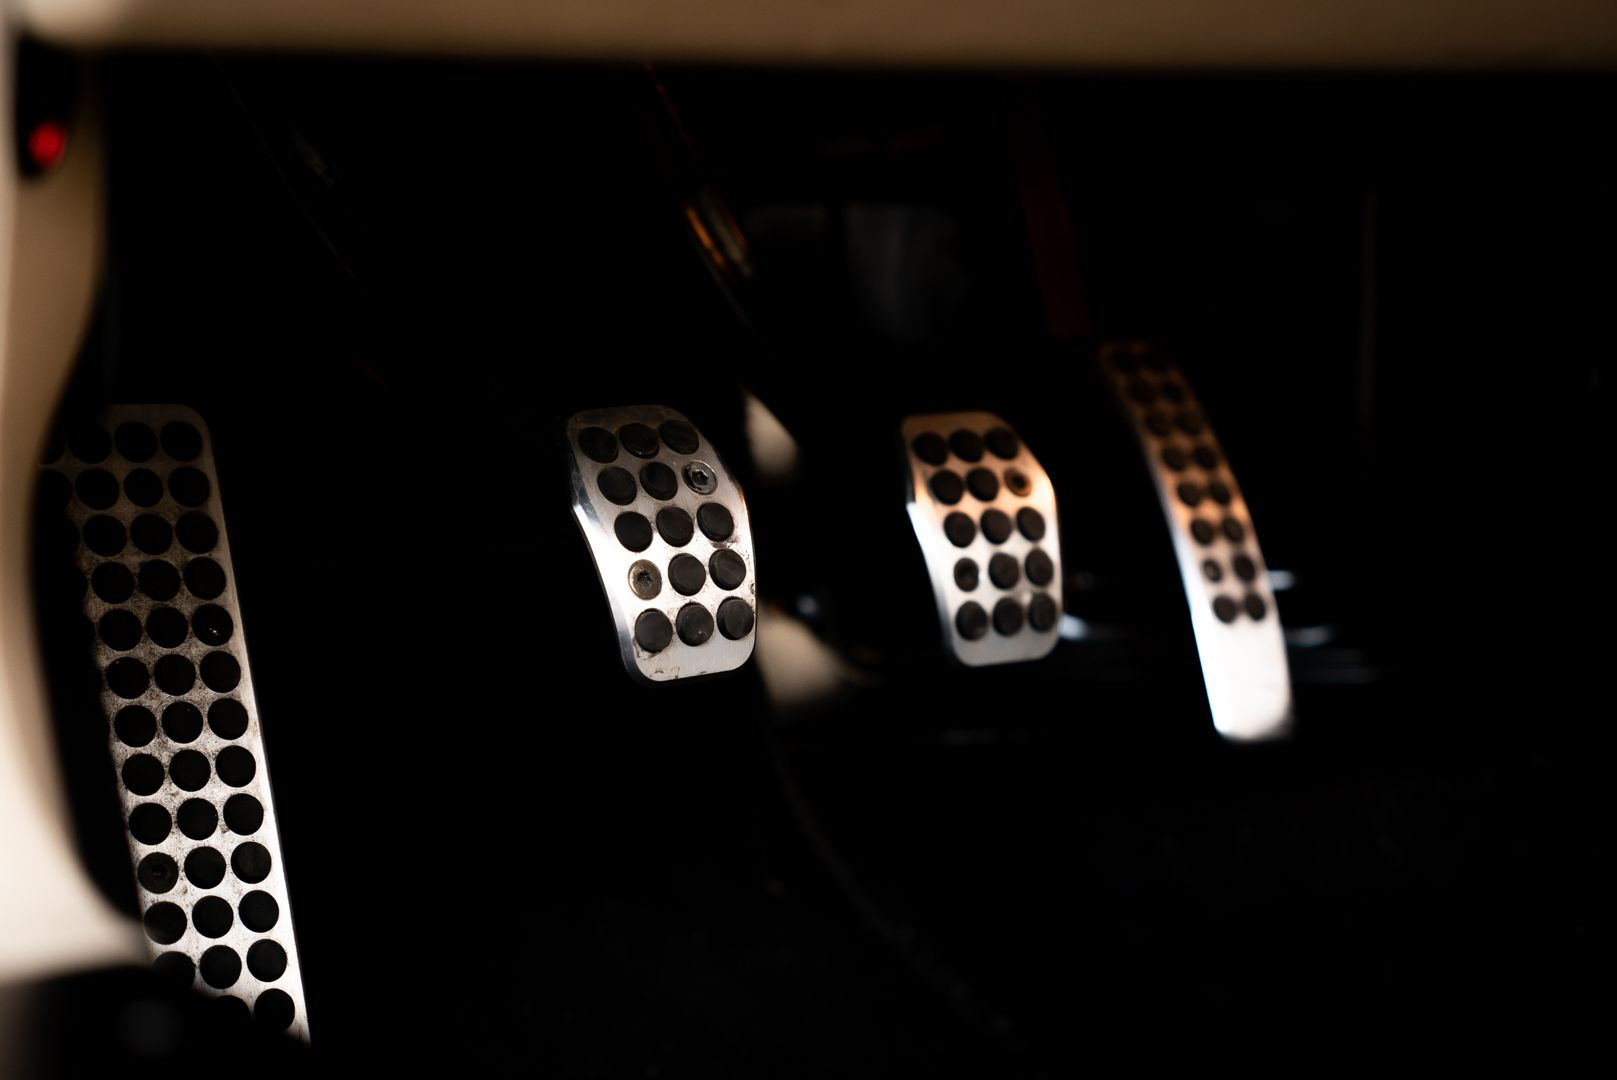 2008 Aston Martin 4.3 V8 Vantage Roadster N400 82827